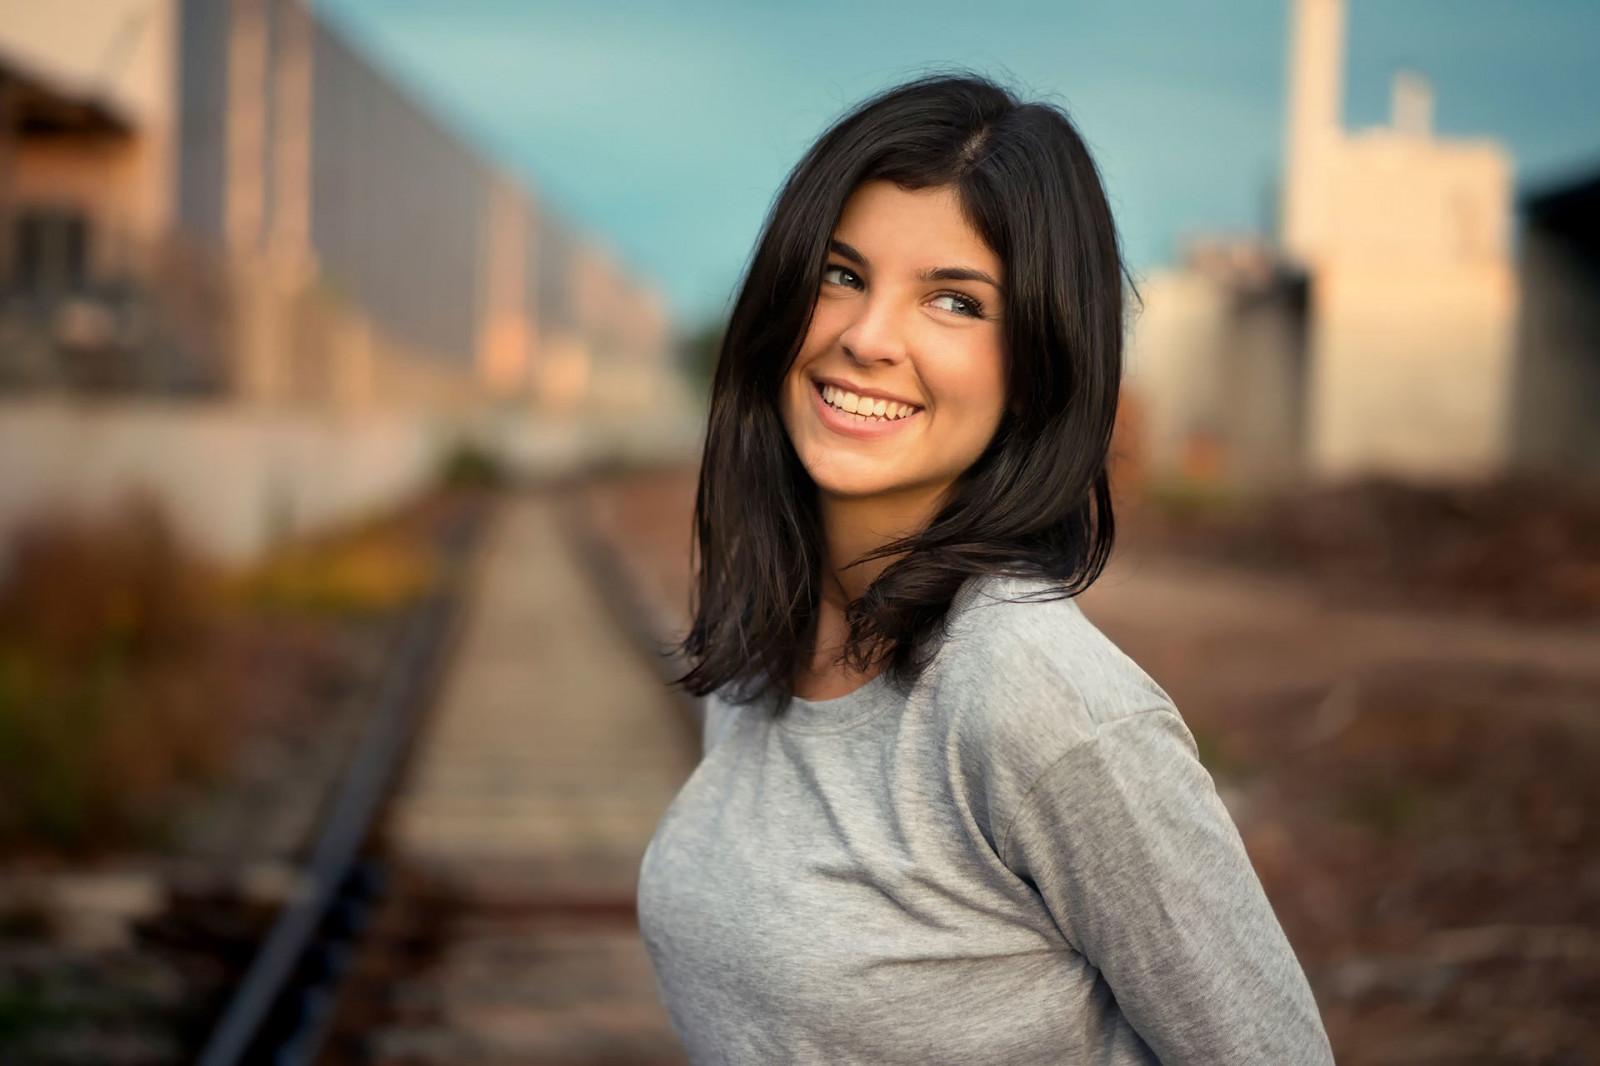 Wallpaper Face Women Outdoors Model Looking Away